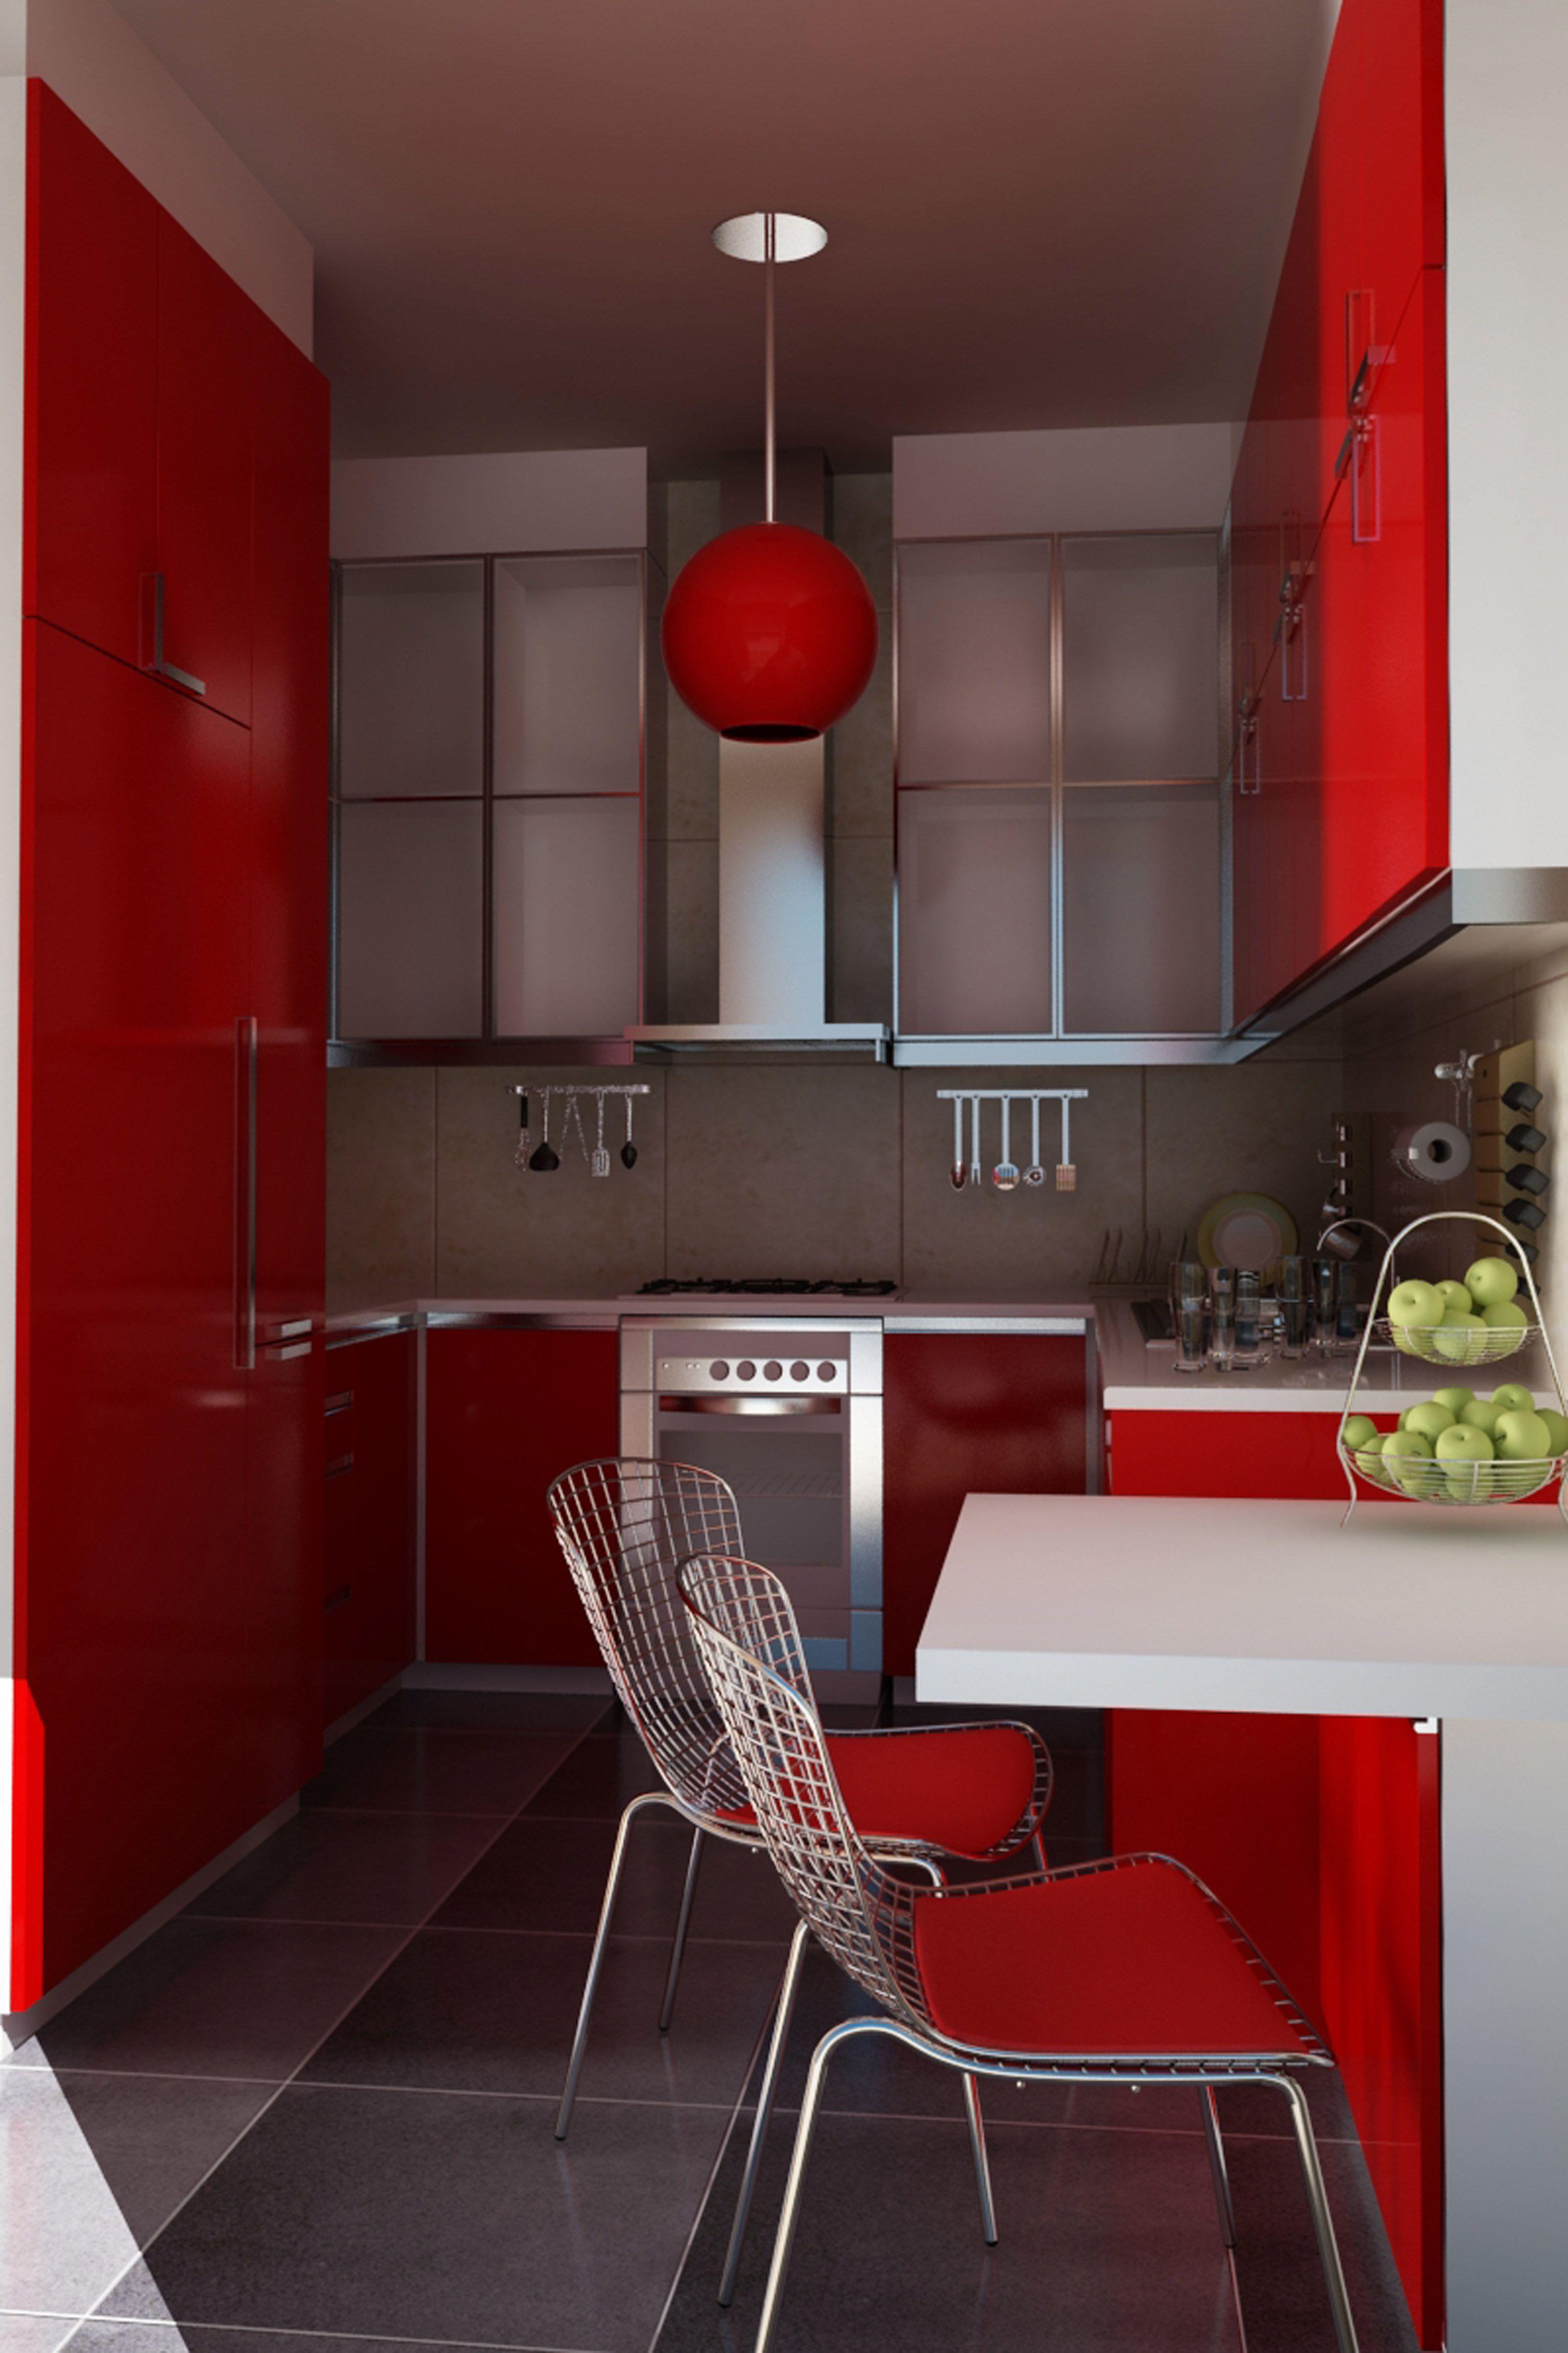 Kitchen Design Ideas For A Small Kitchen Modern Kitchen Design Ideas Narrow Galley Kitchen Des Small Modern Kitchens Kitchen Design Small Cheap Kitchen Remodel